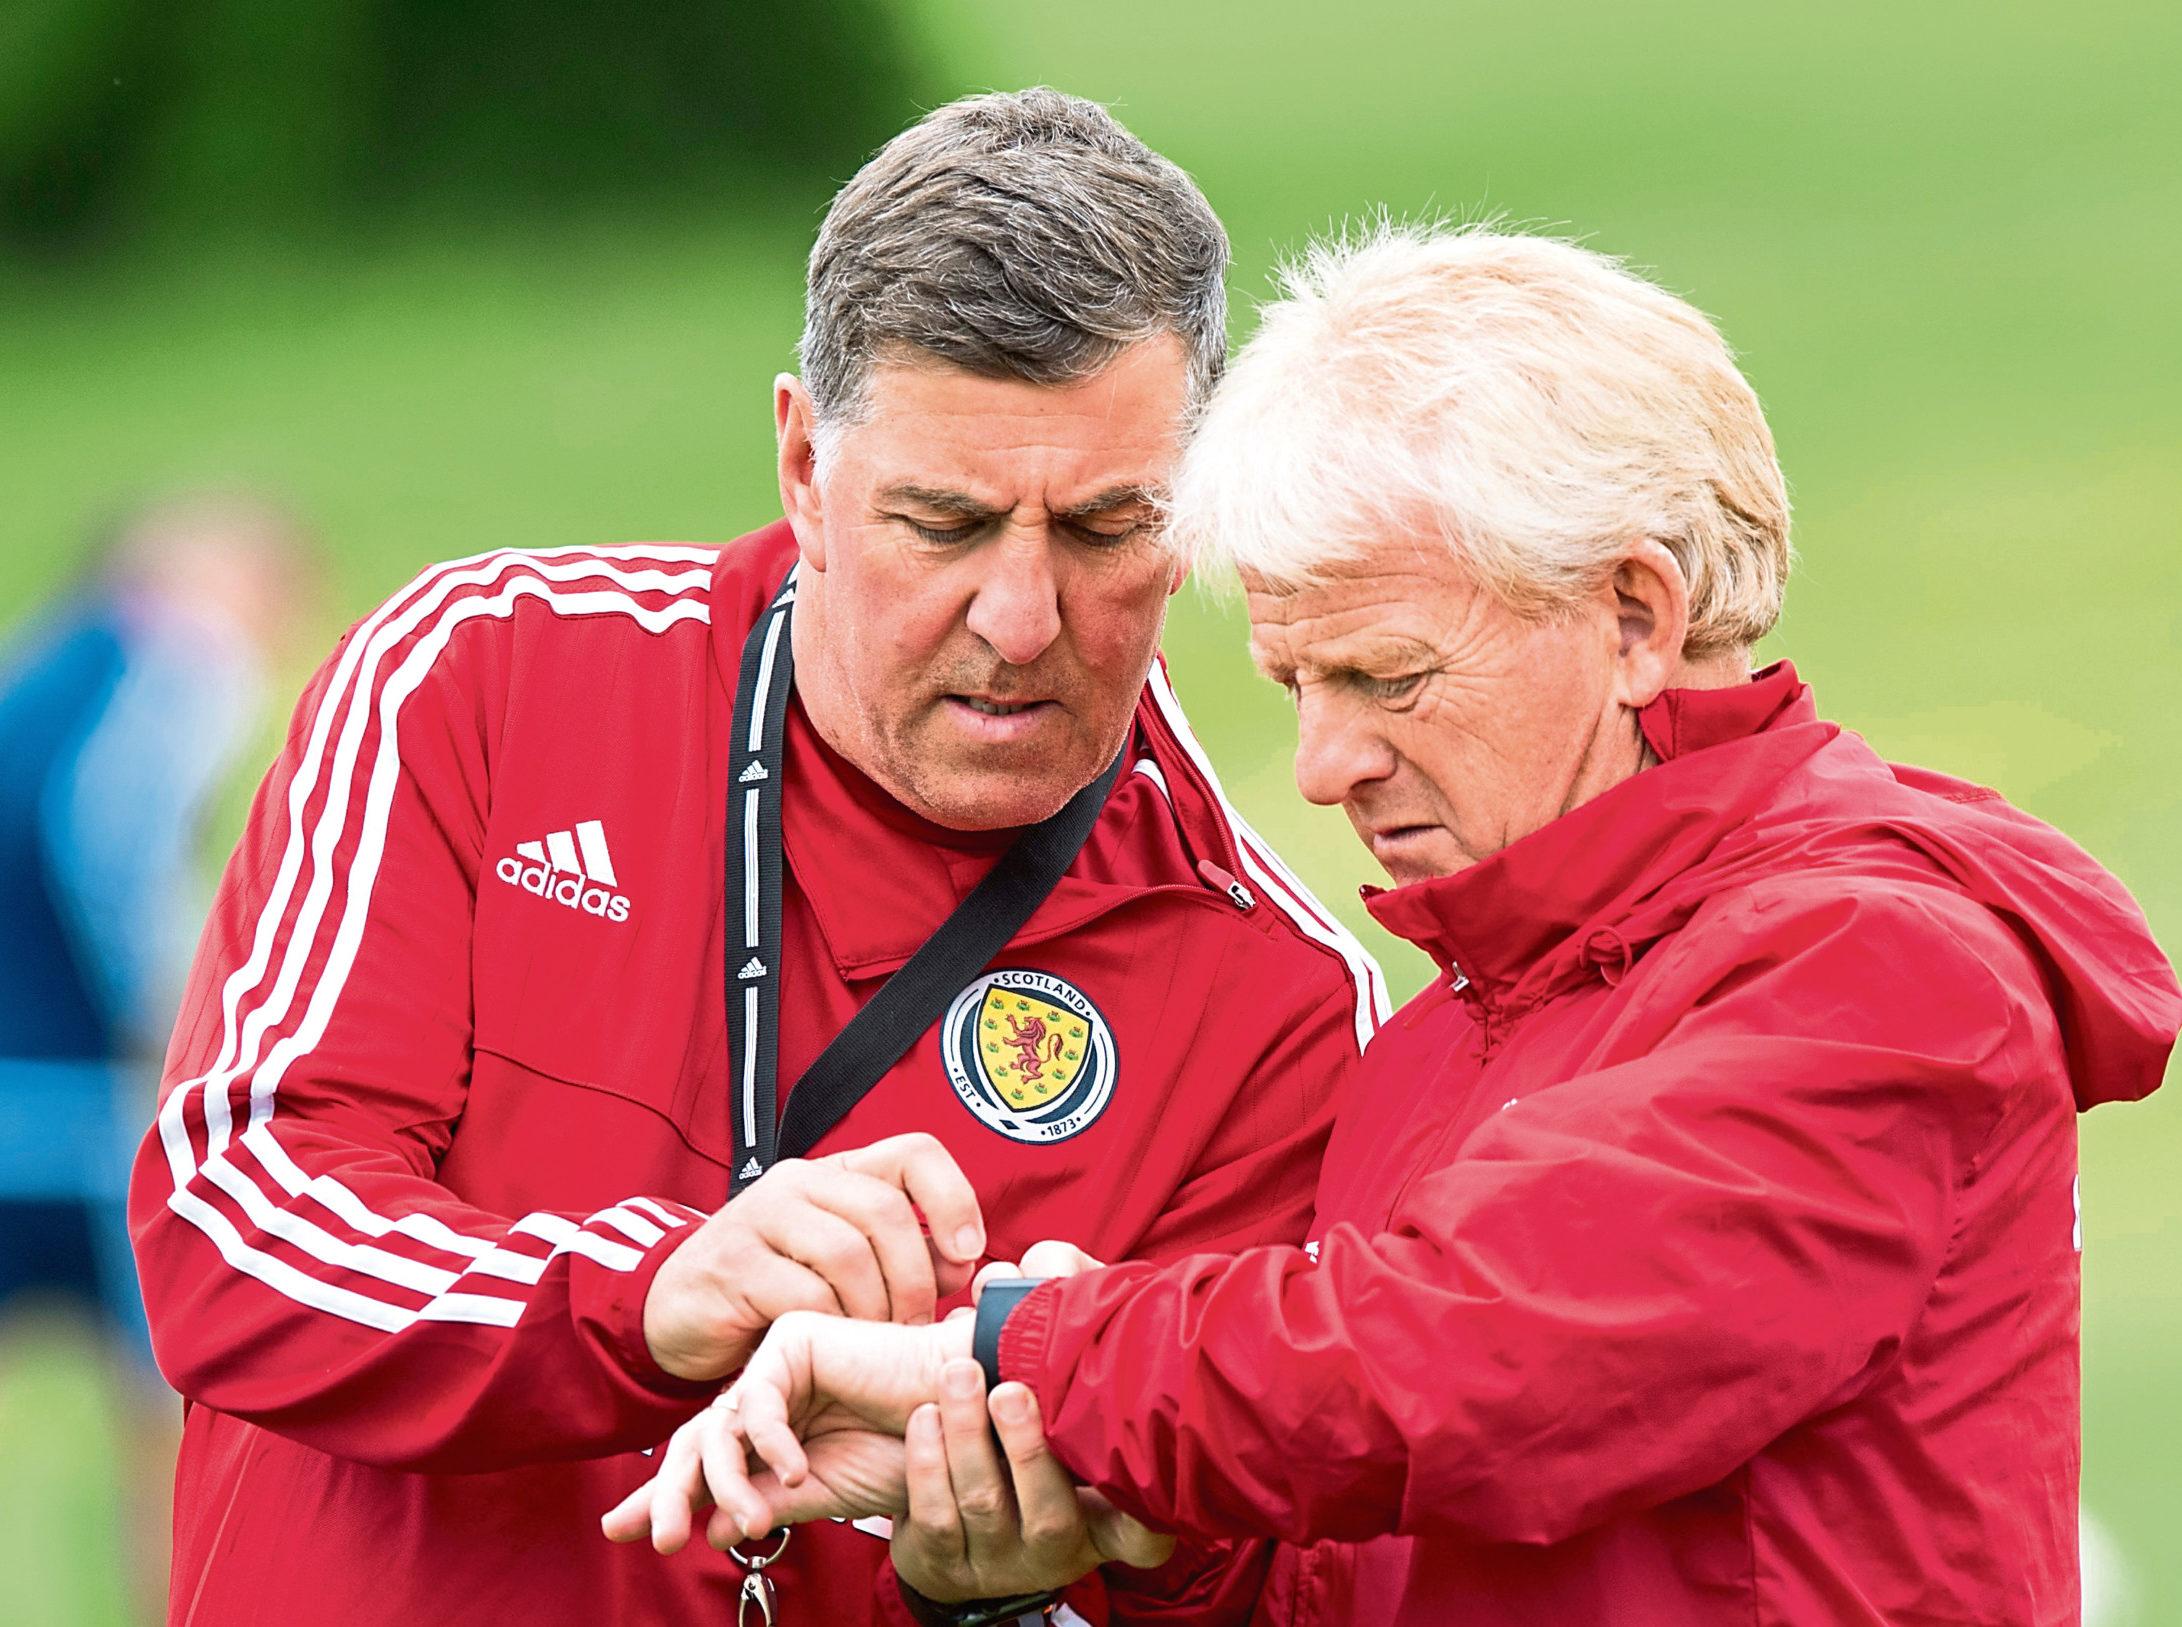 09/06/17 SCOTLAND TRAINING MAR HALL Scotland manager Gordon Strachan (right)